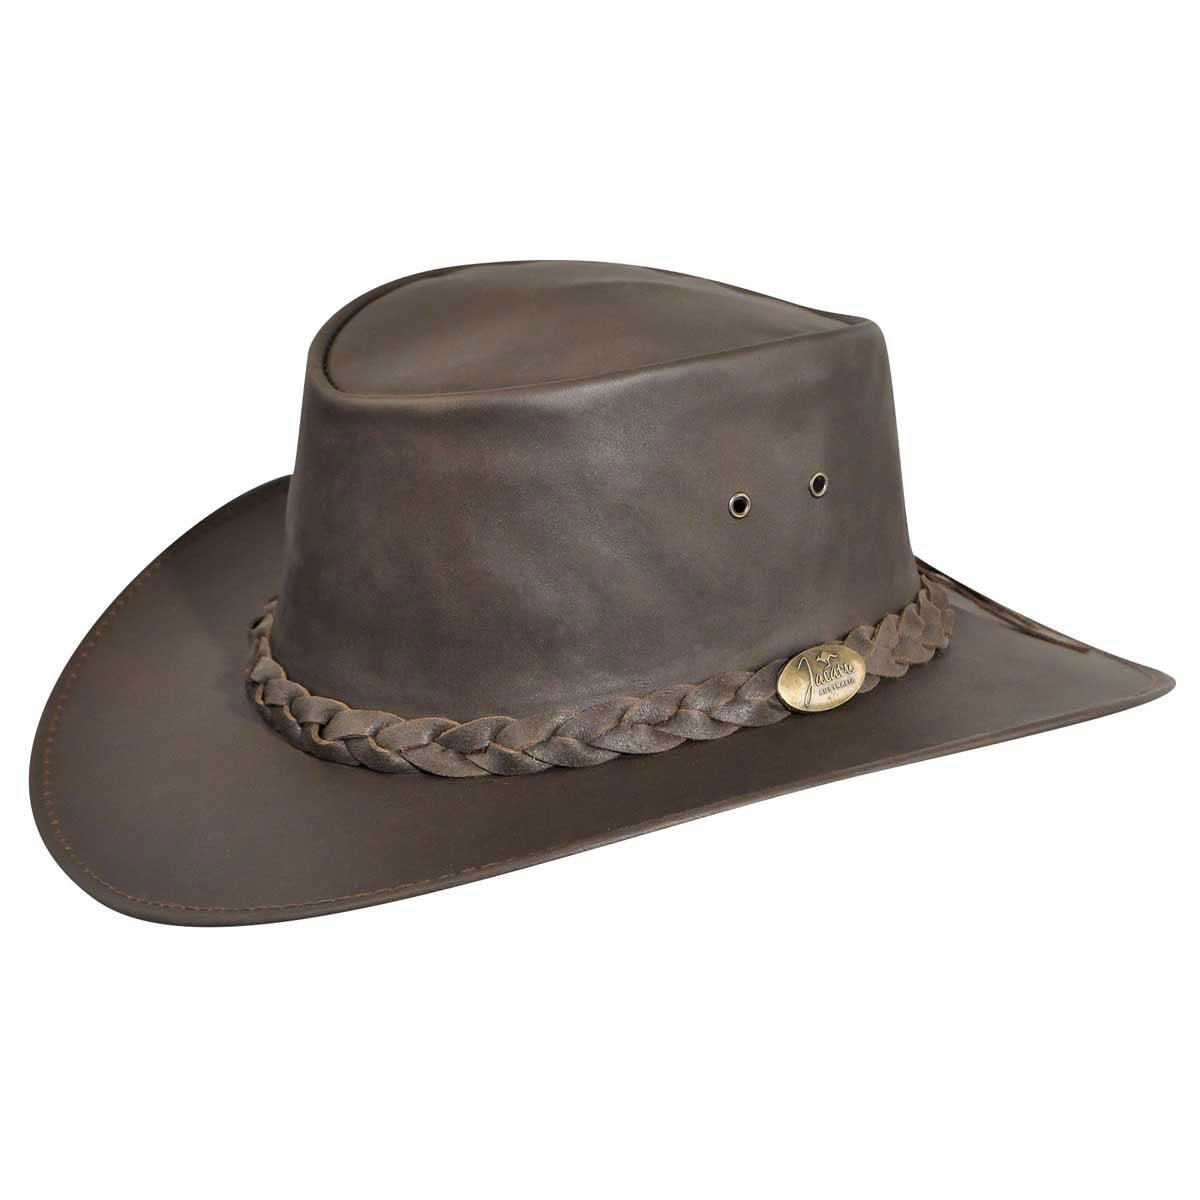 Jacaru Kangaroo Outback Hat in Brown